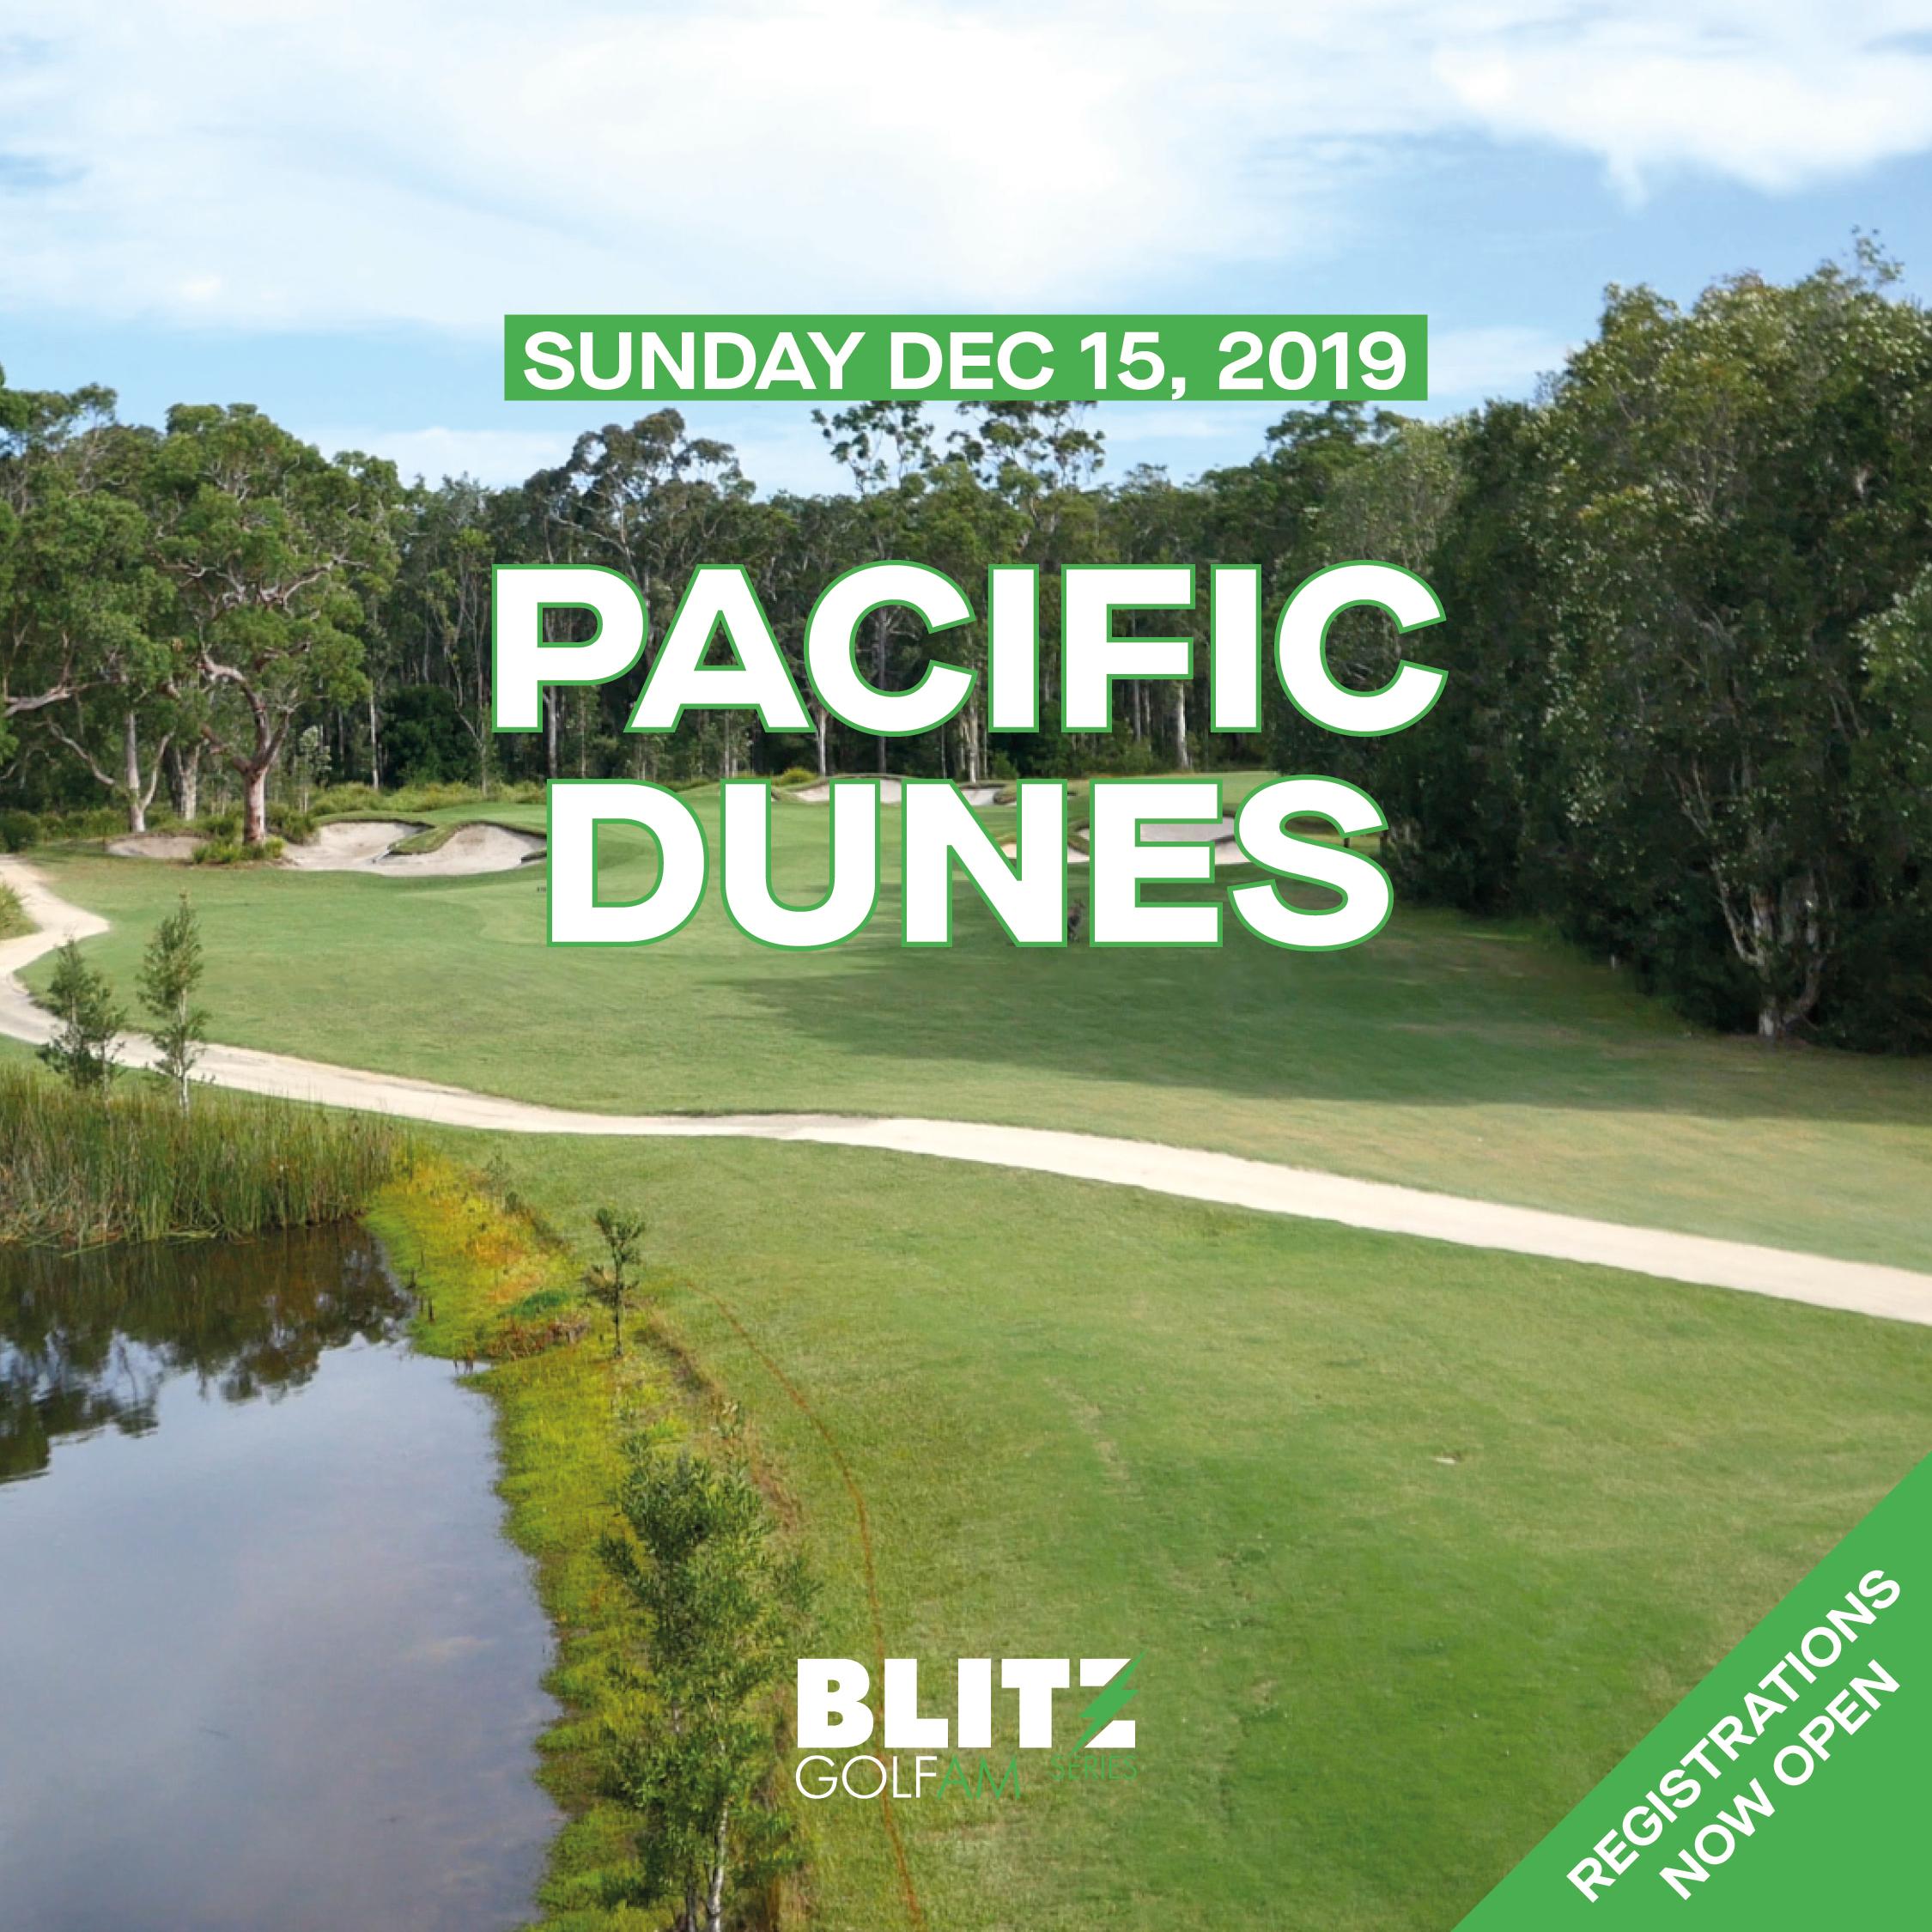 NSWACT_Pacific Dunes_Blitz 2020_AM Series Launch_151219.jpg